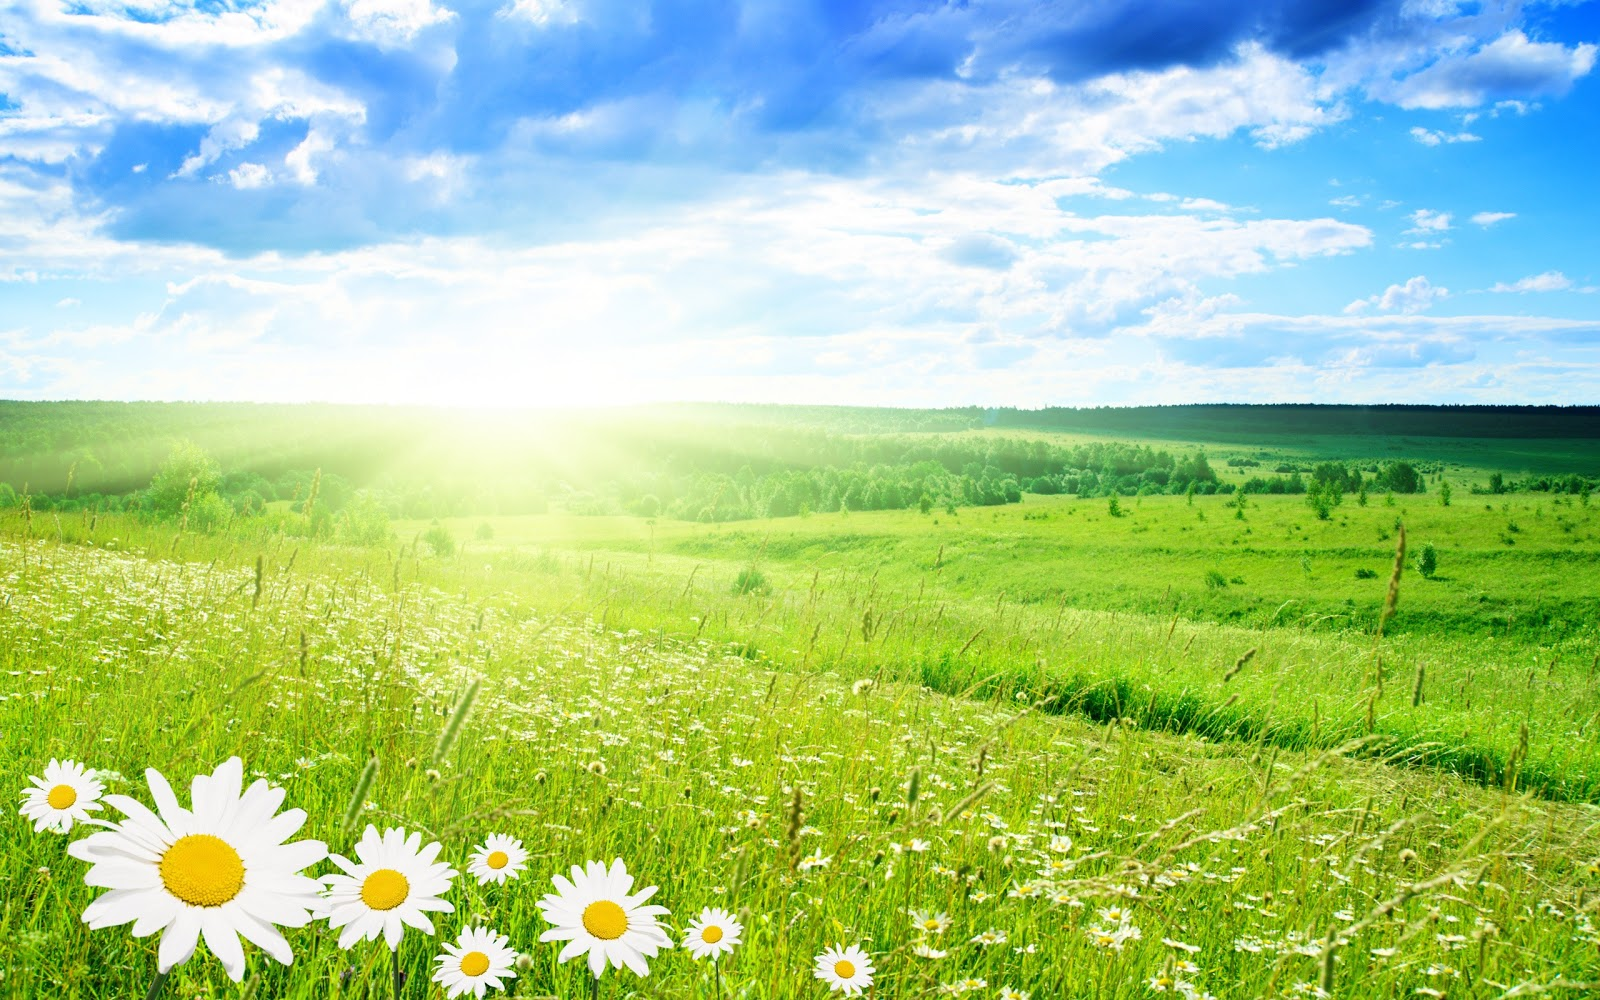 green-landscapes-flowers-daisy-green-field-bright-HD-Wallpapers.jpg